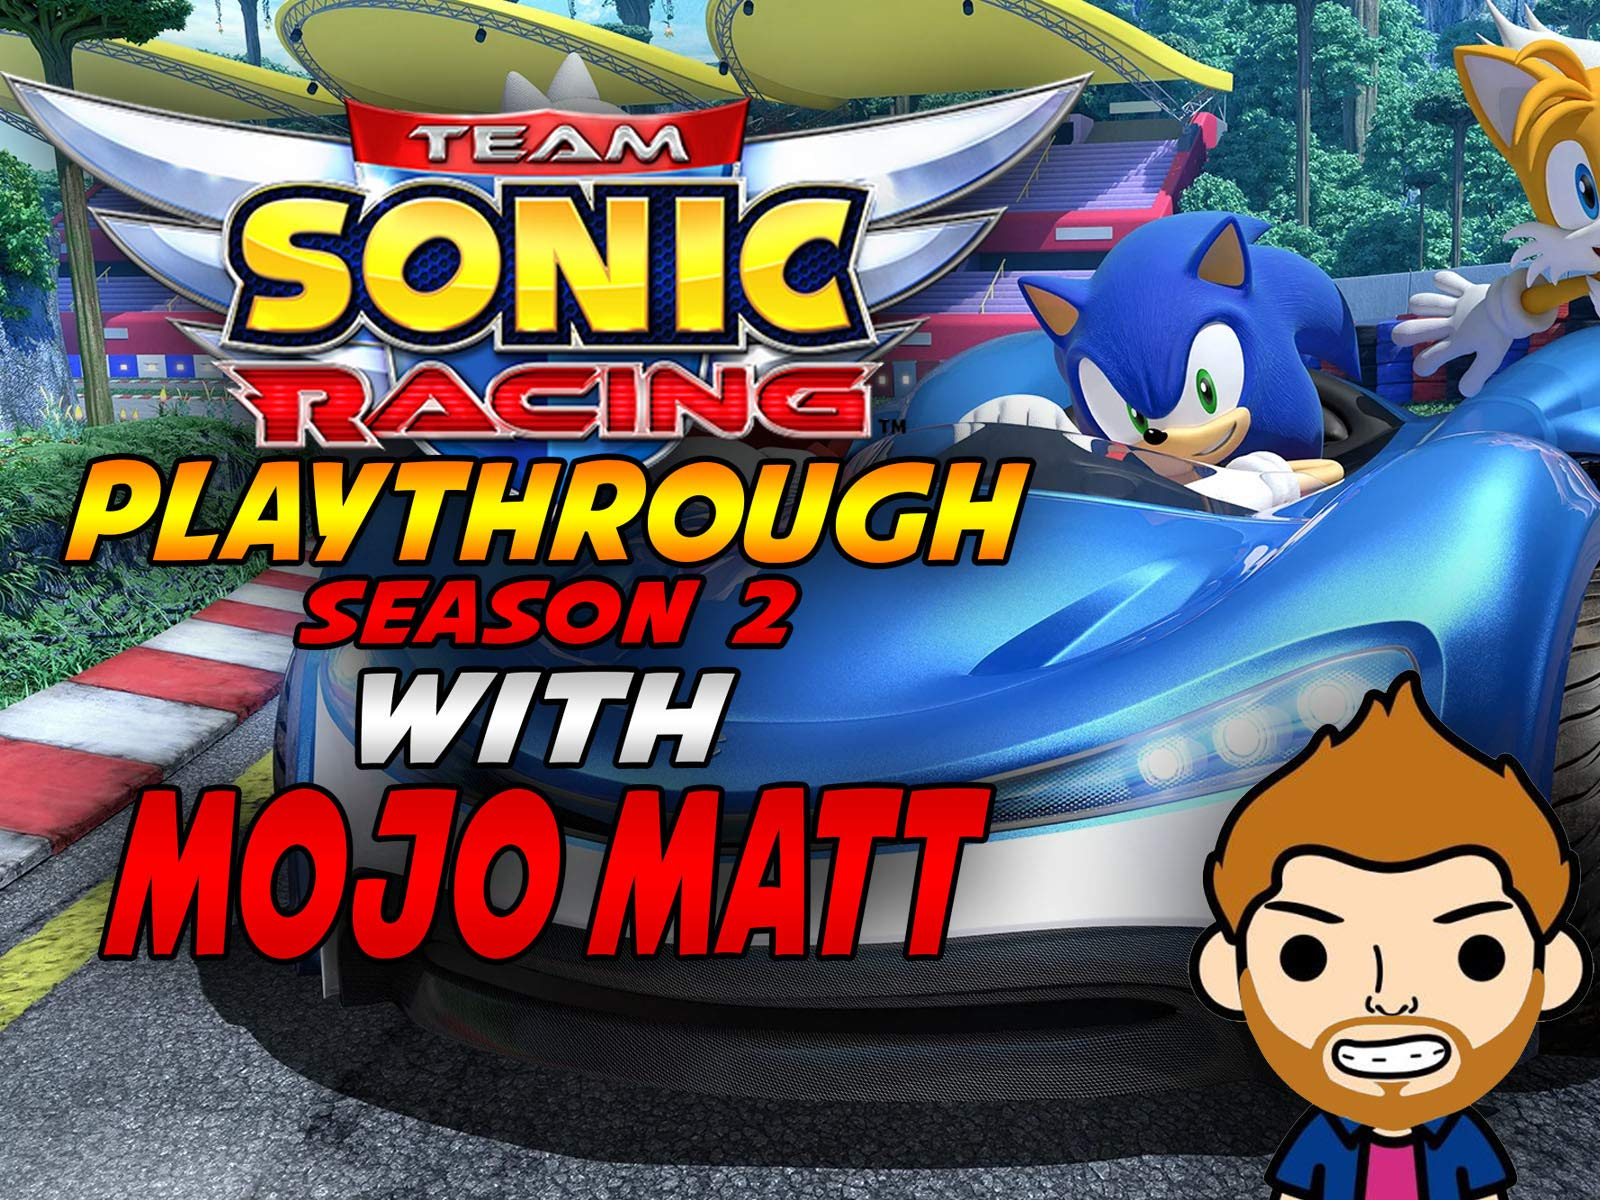 Team Sonic Racing Playthrough With Mojo Matt on Amazon Prime Instant Video UK